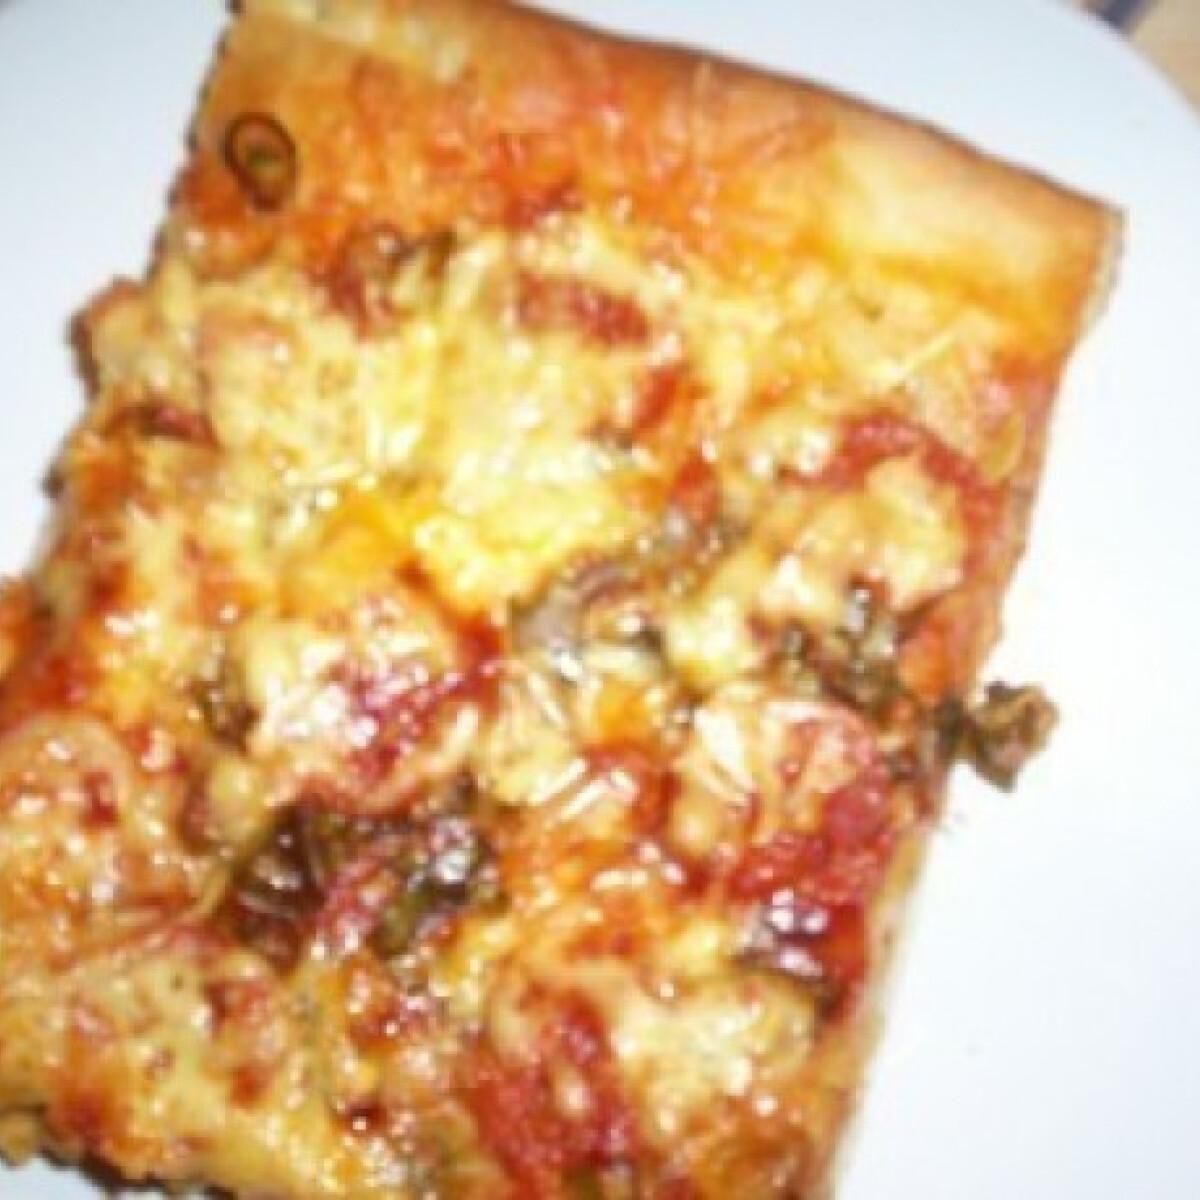 Tepsis pizza - magyaros pizza 3.